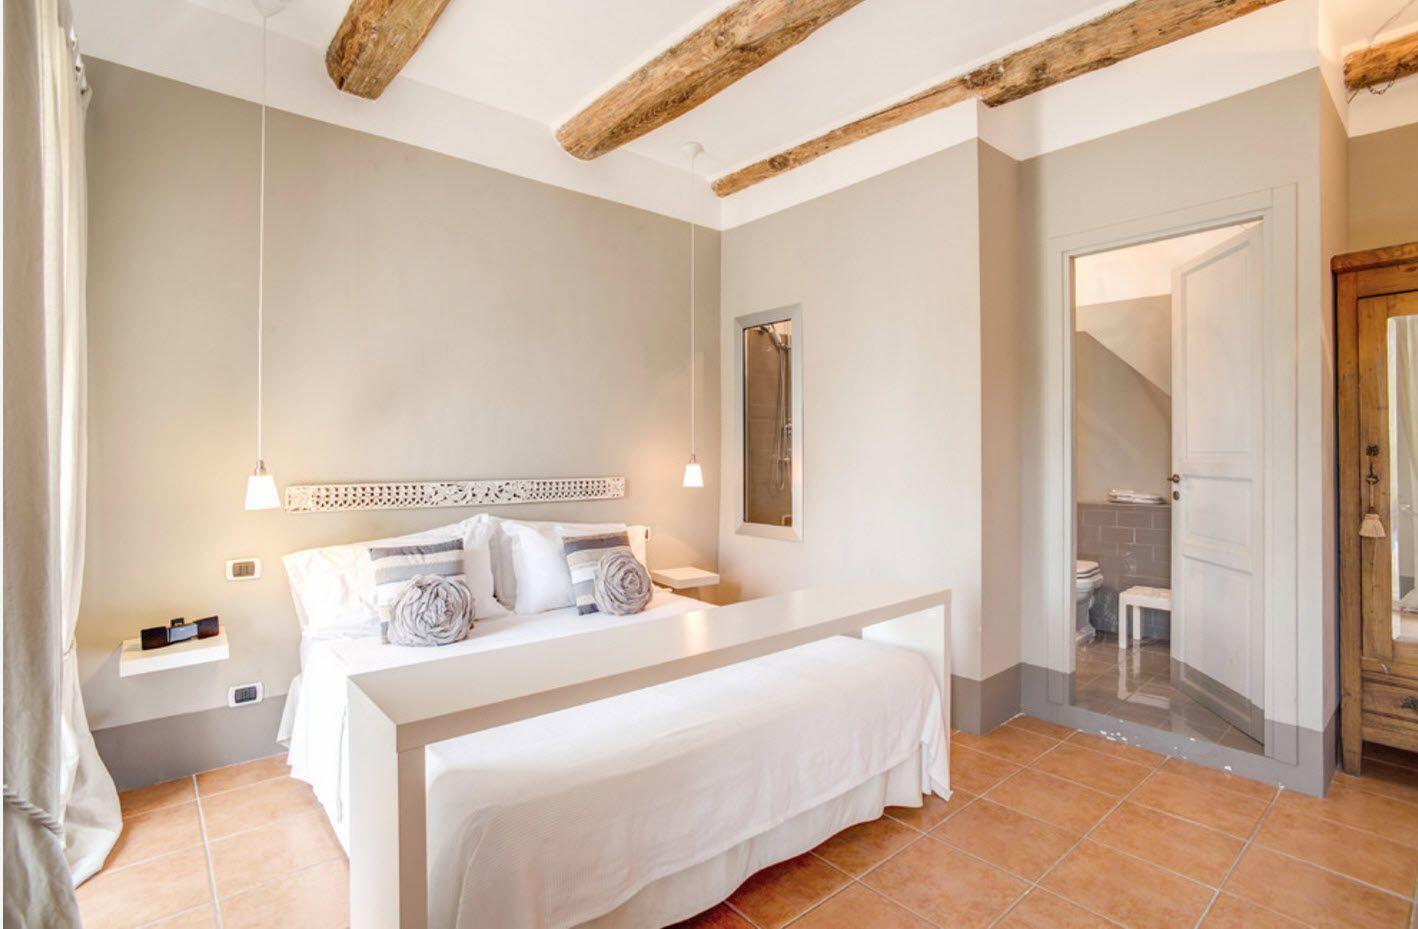 Ceiling beams of large logs in the modern Scandinavian style bedroom image